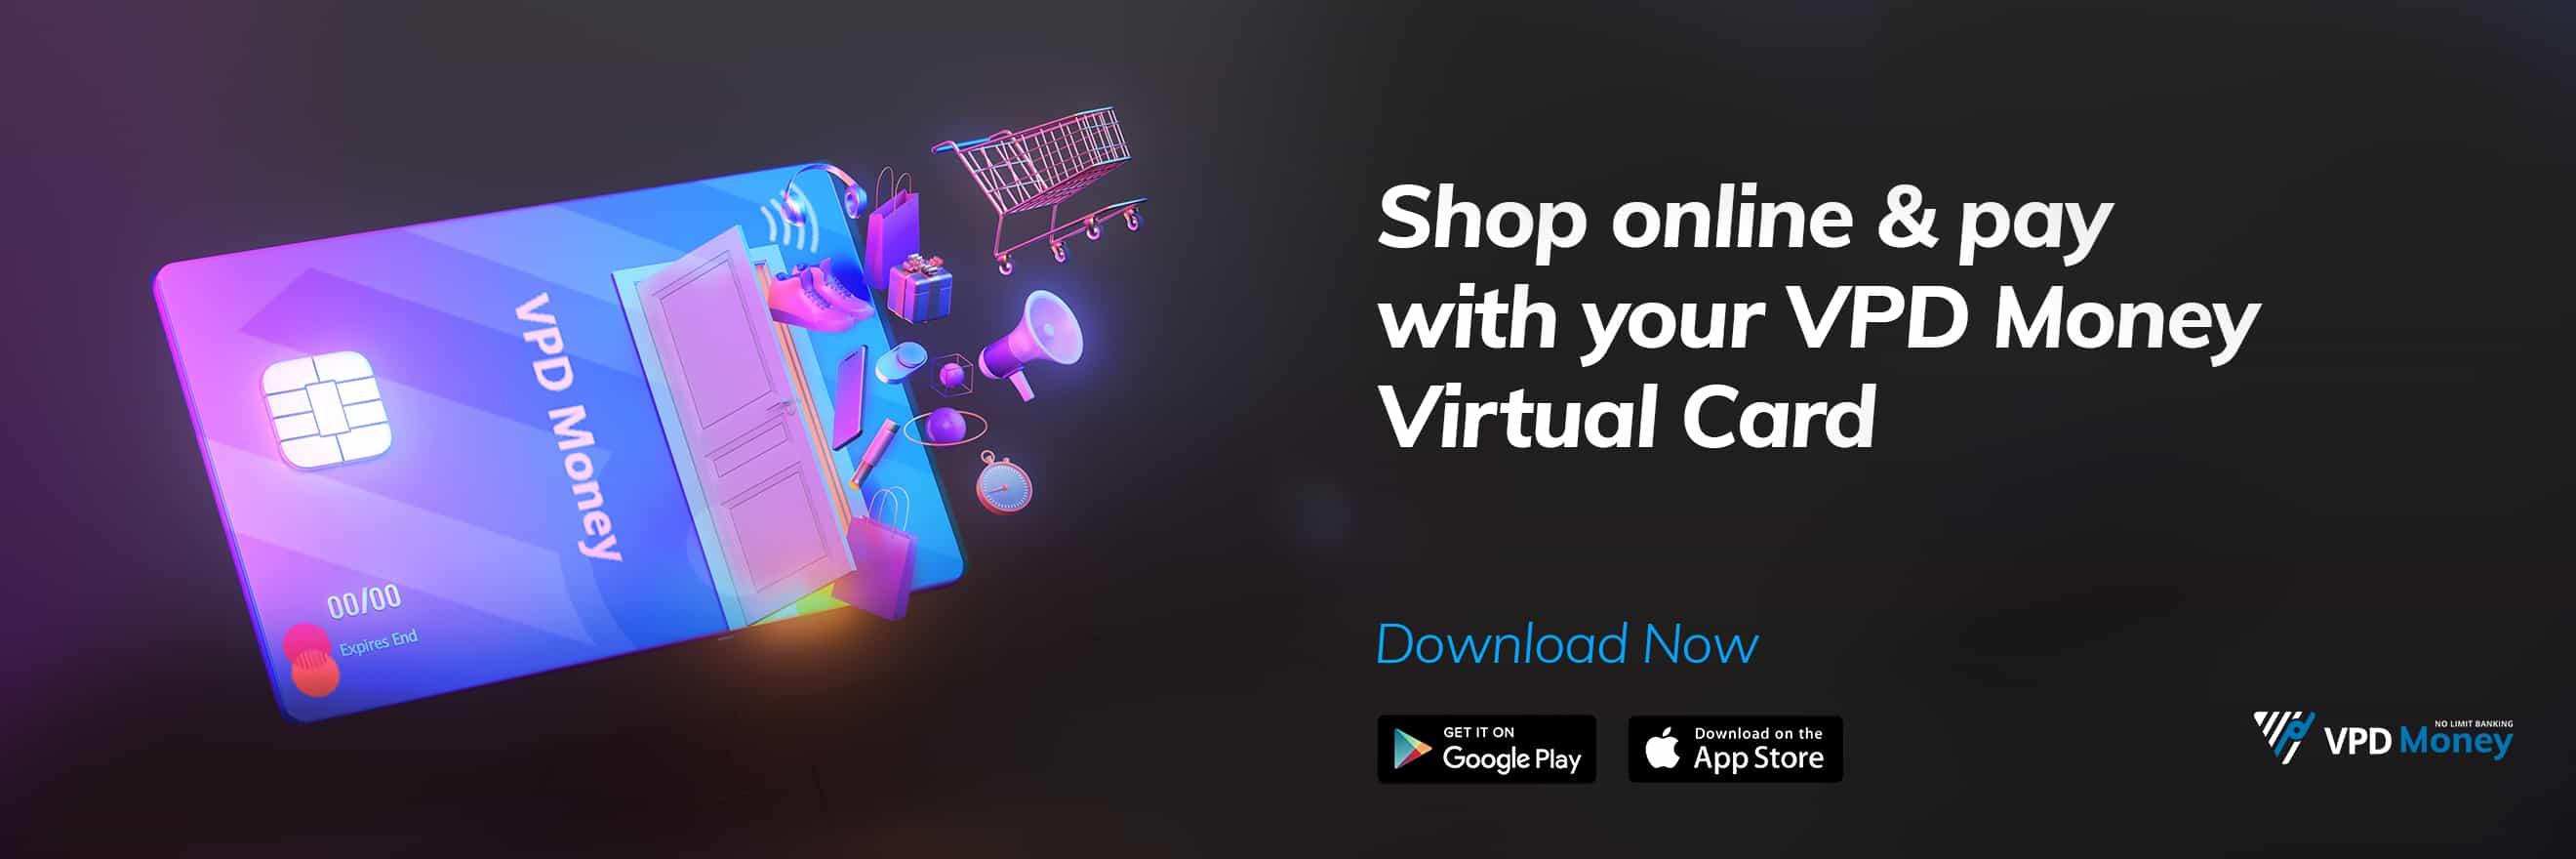 Shop online with VPD money